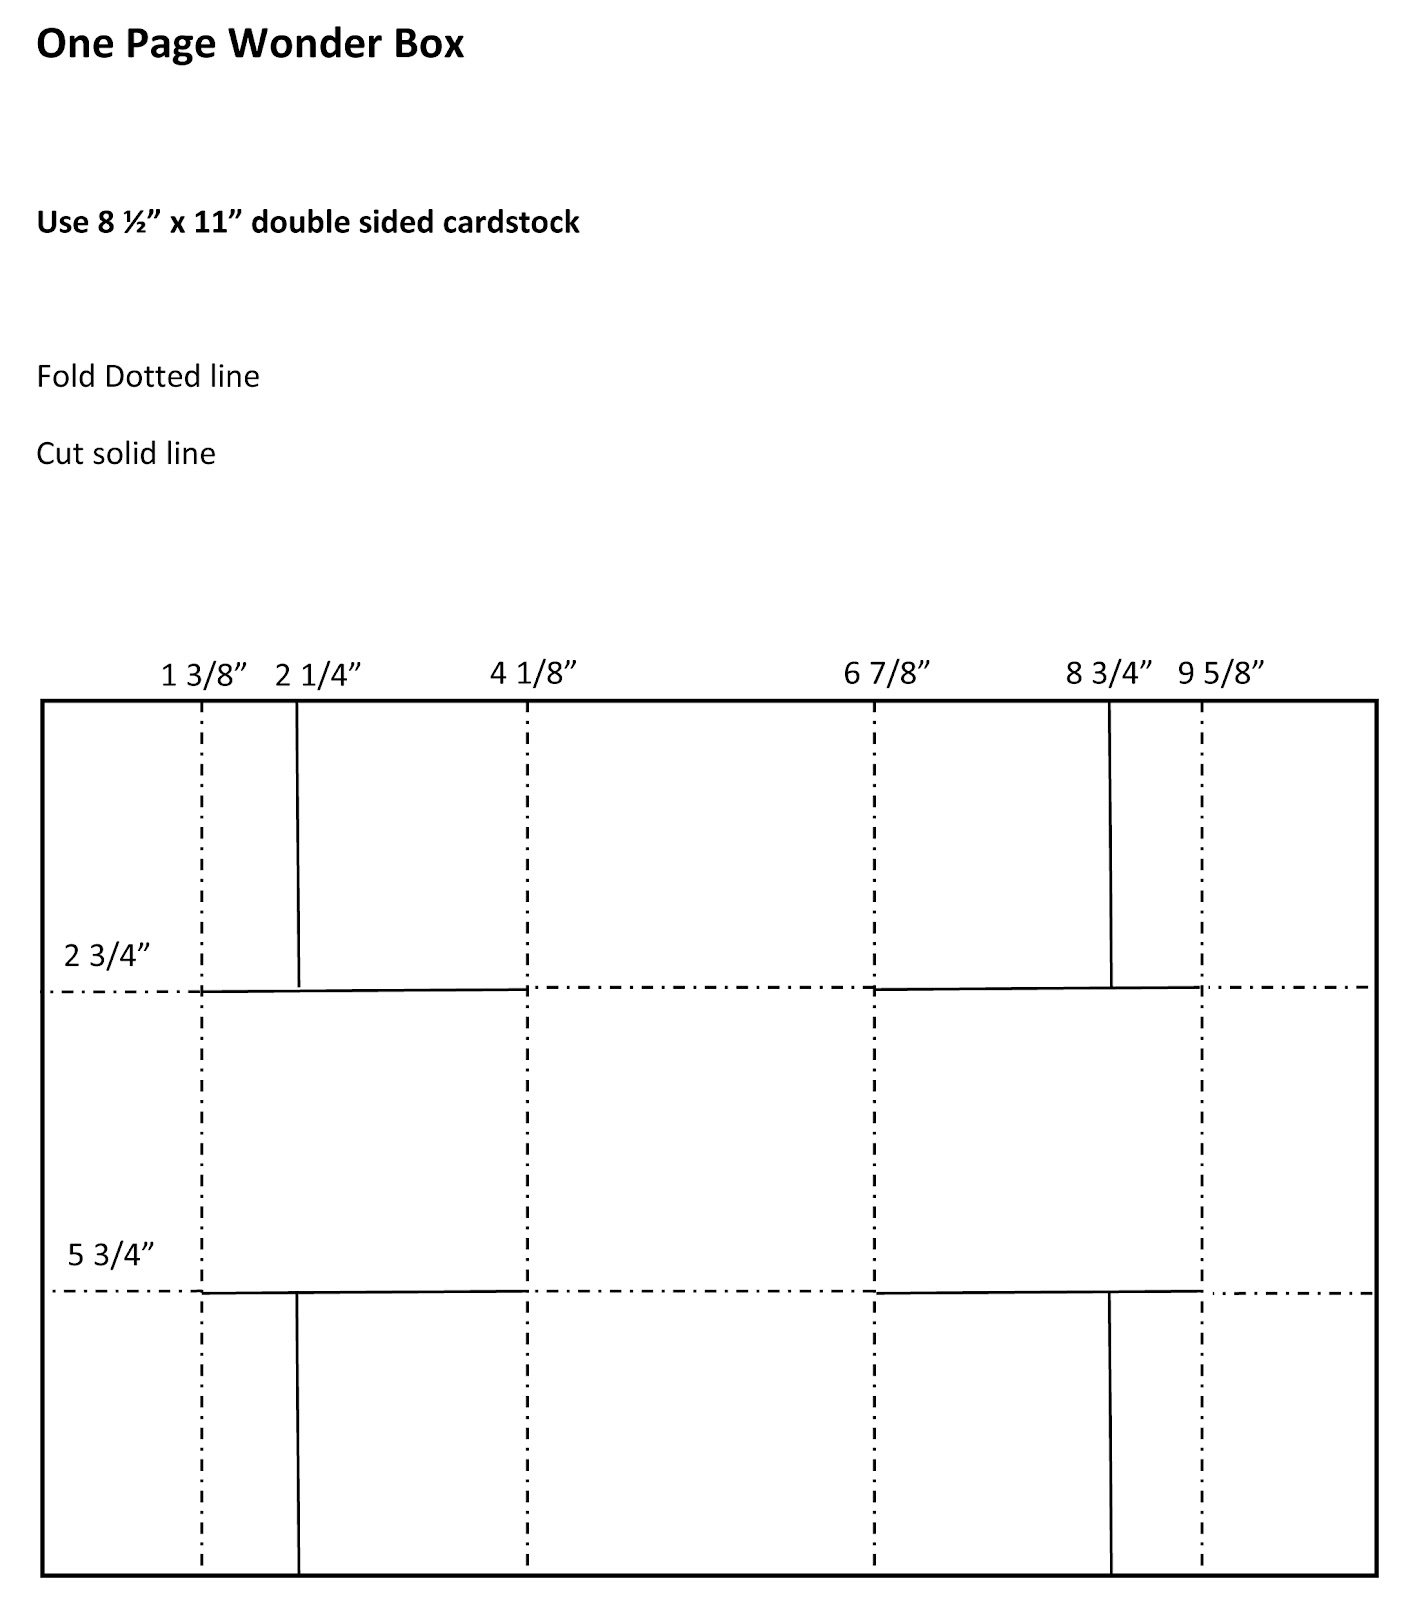 One Page Wonder Box sketch.jpg